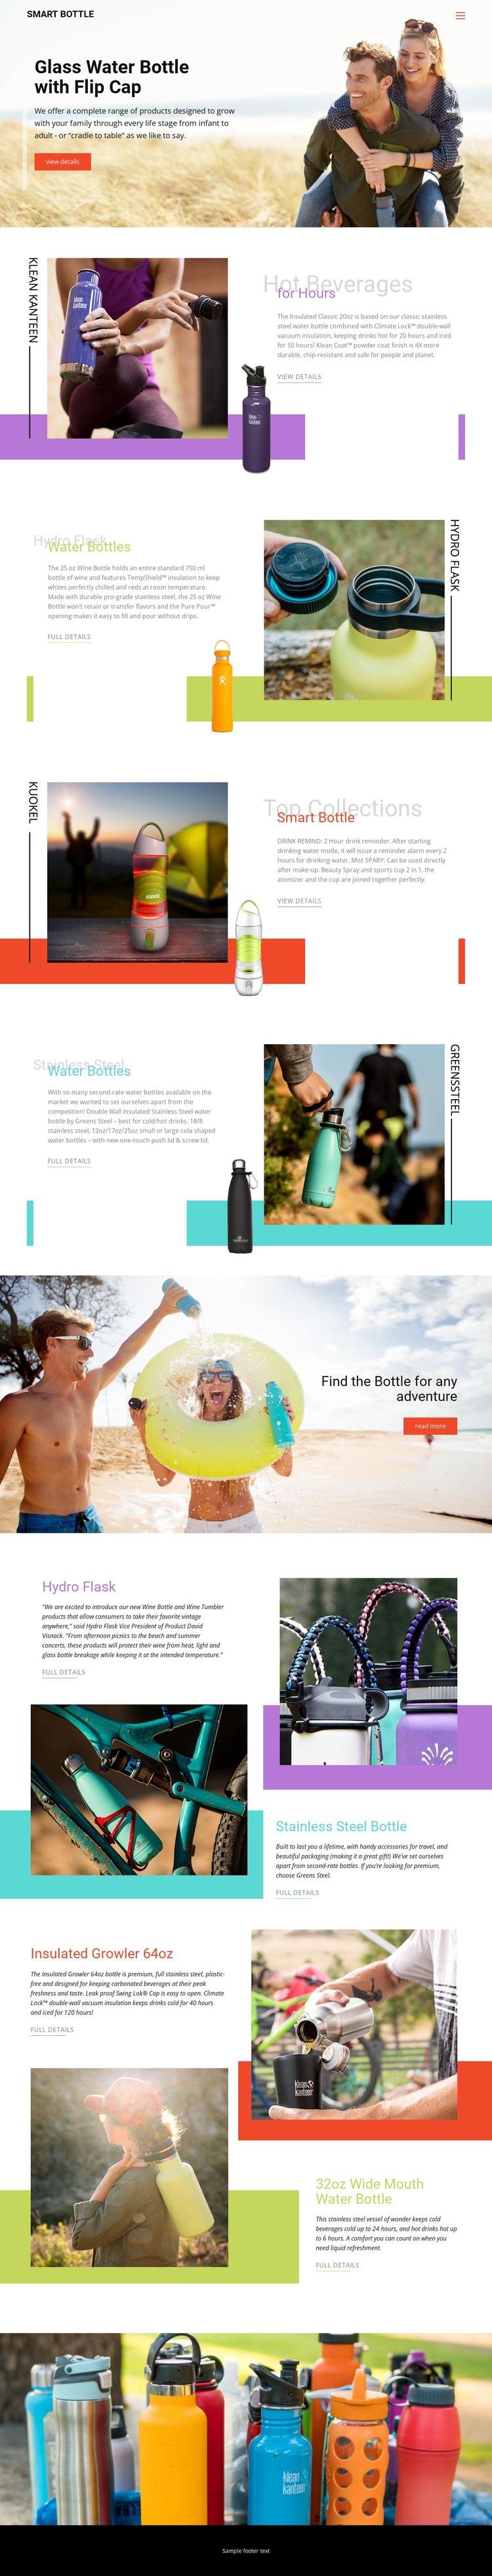 Water Bottles Website Builder Software